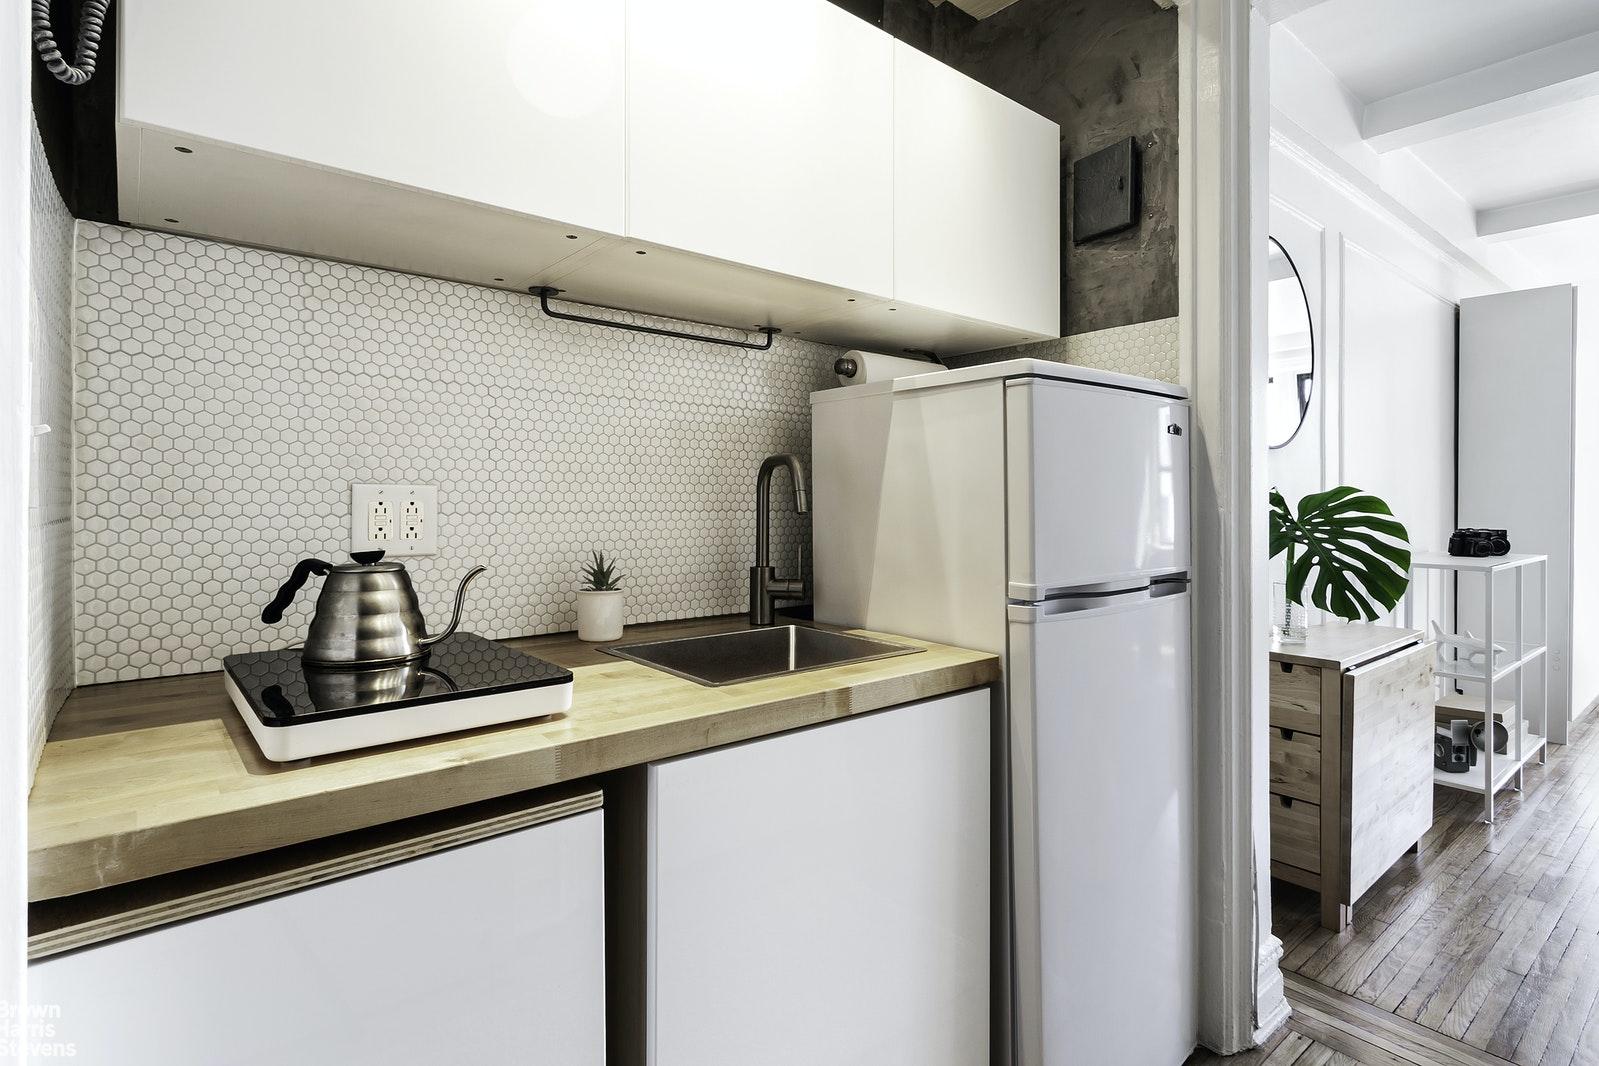 457 WEST 57TH STREET 1403, Midtown West, $365,000, Web #: 20753567